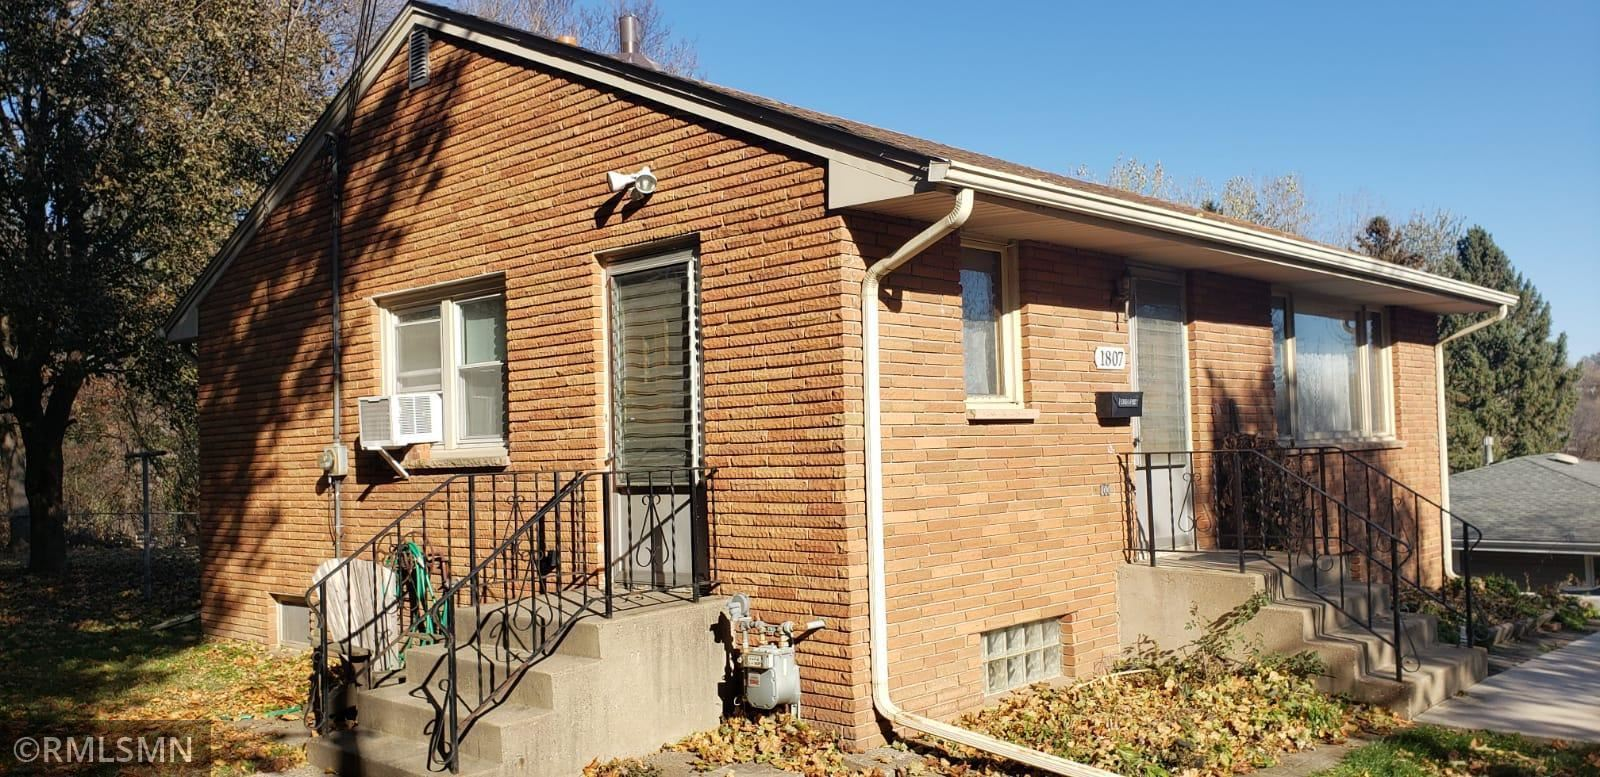 1807 Wilson Avenue, Saint Paul, MN 55119 - MLS#: 5681156